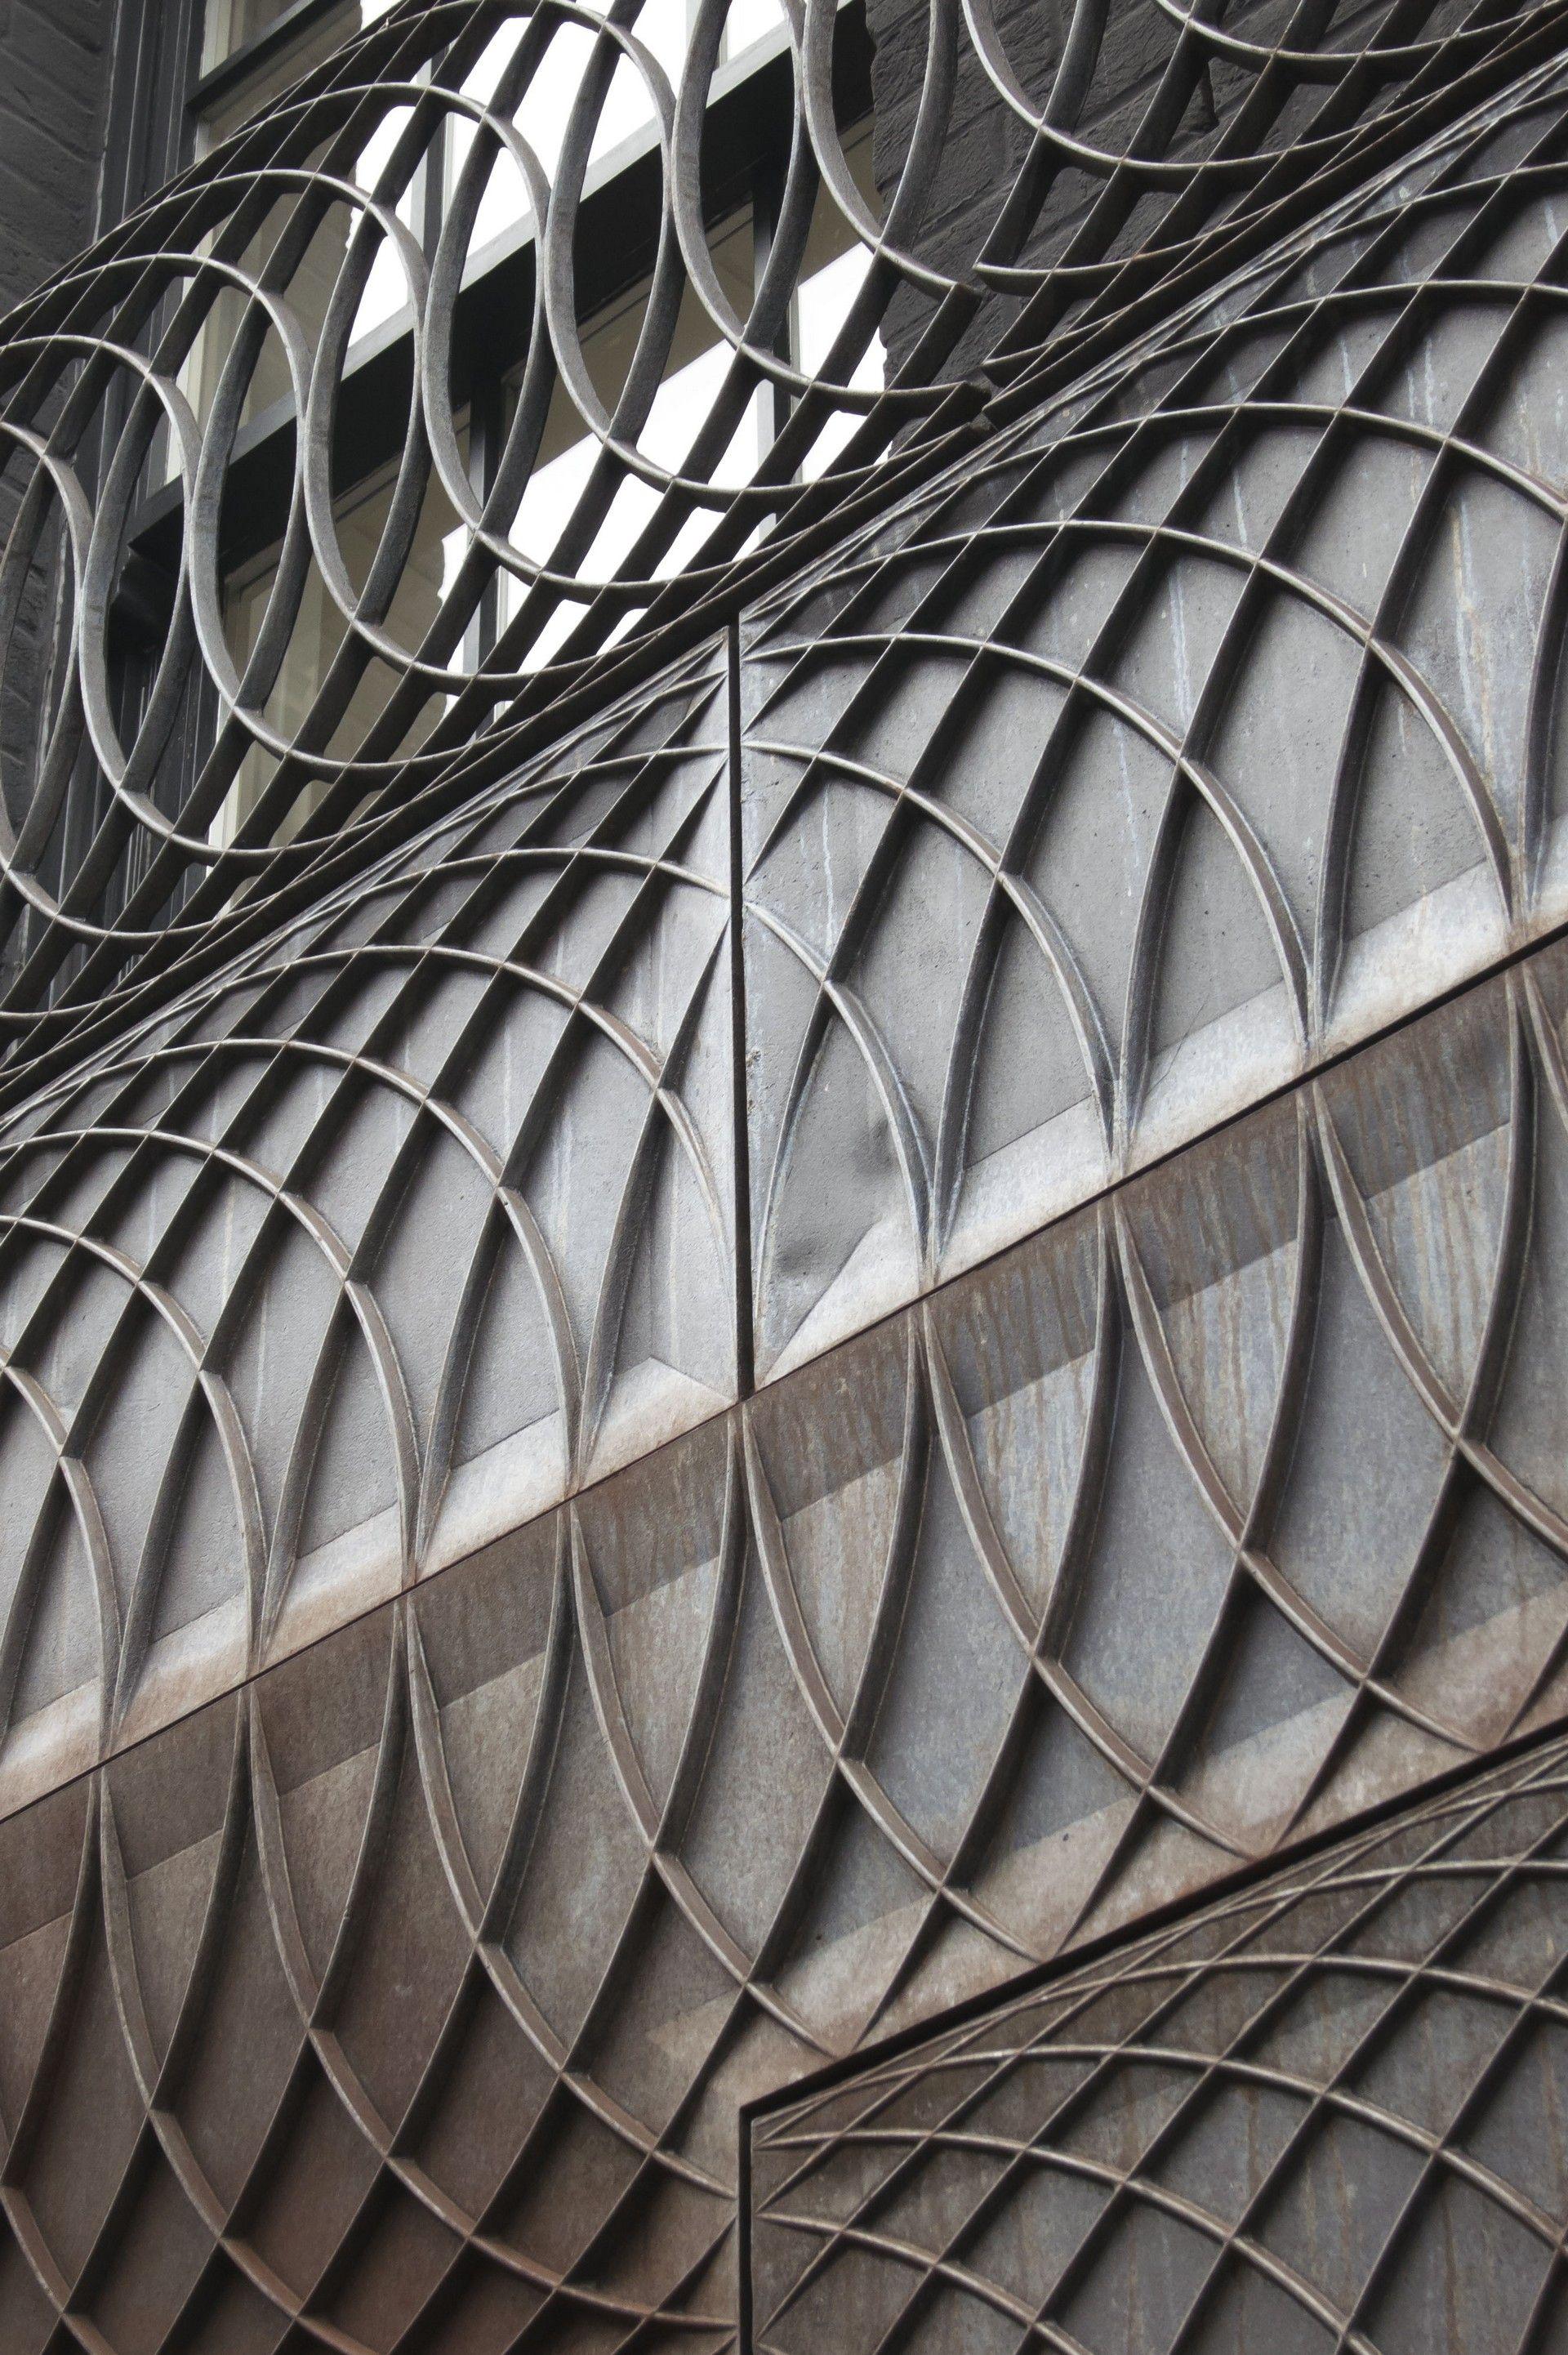 Cast Iron Facade Metalwork Paul Smith Albemarle Street Mayfair London 6a Architects 2013 Paul Smith Albemarle Facade